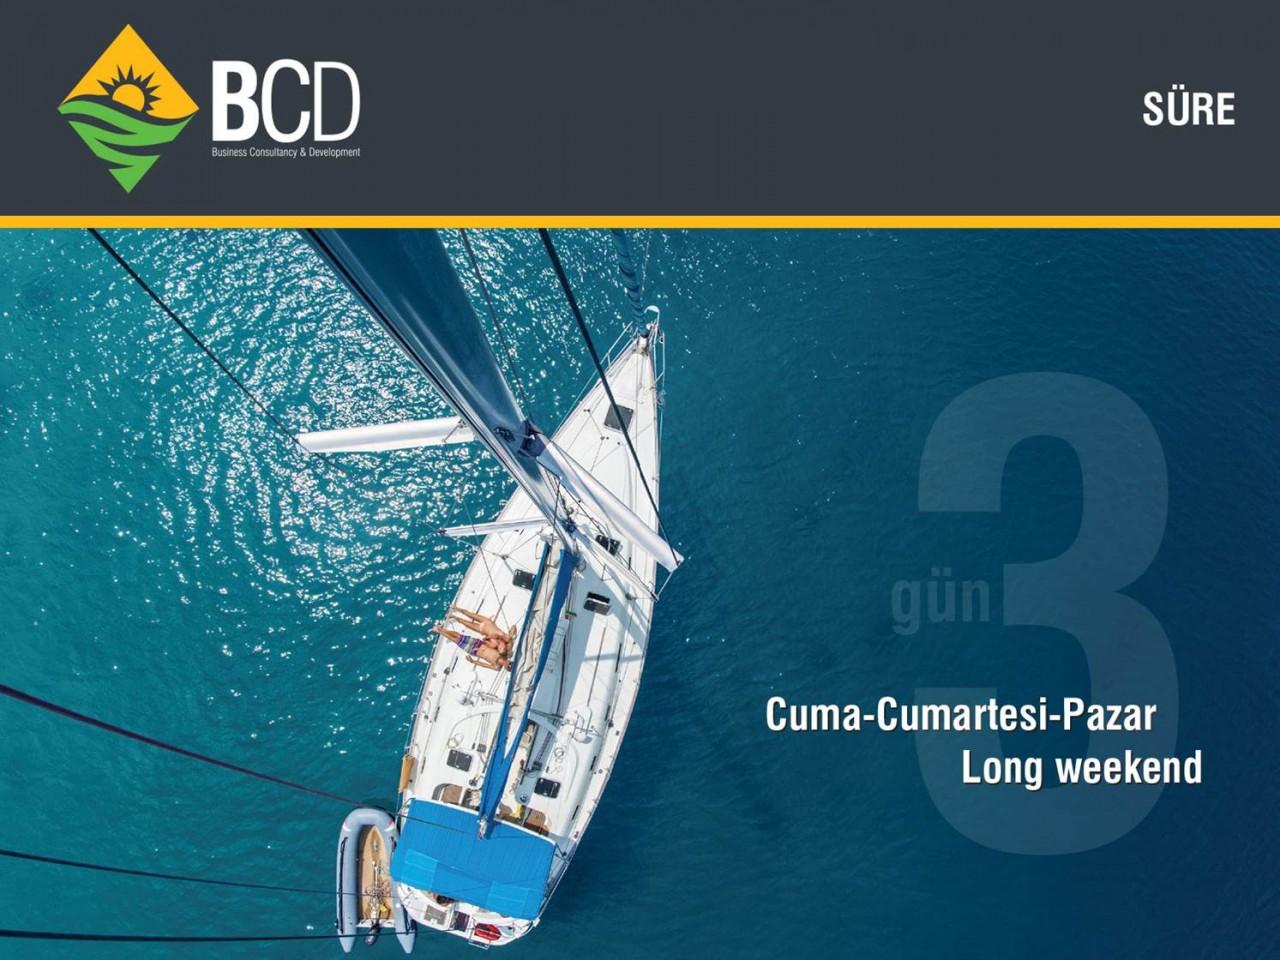 bcdturkey yelken liderlik takim ruhu 8 Leadership & Team Work & Sailing